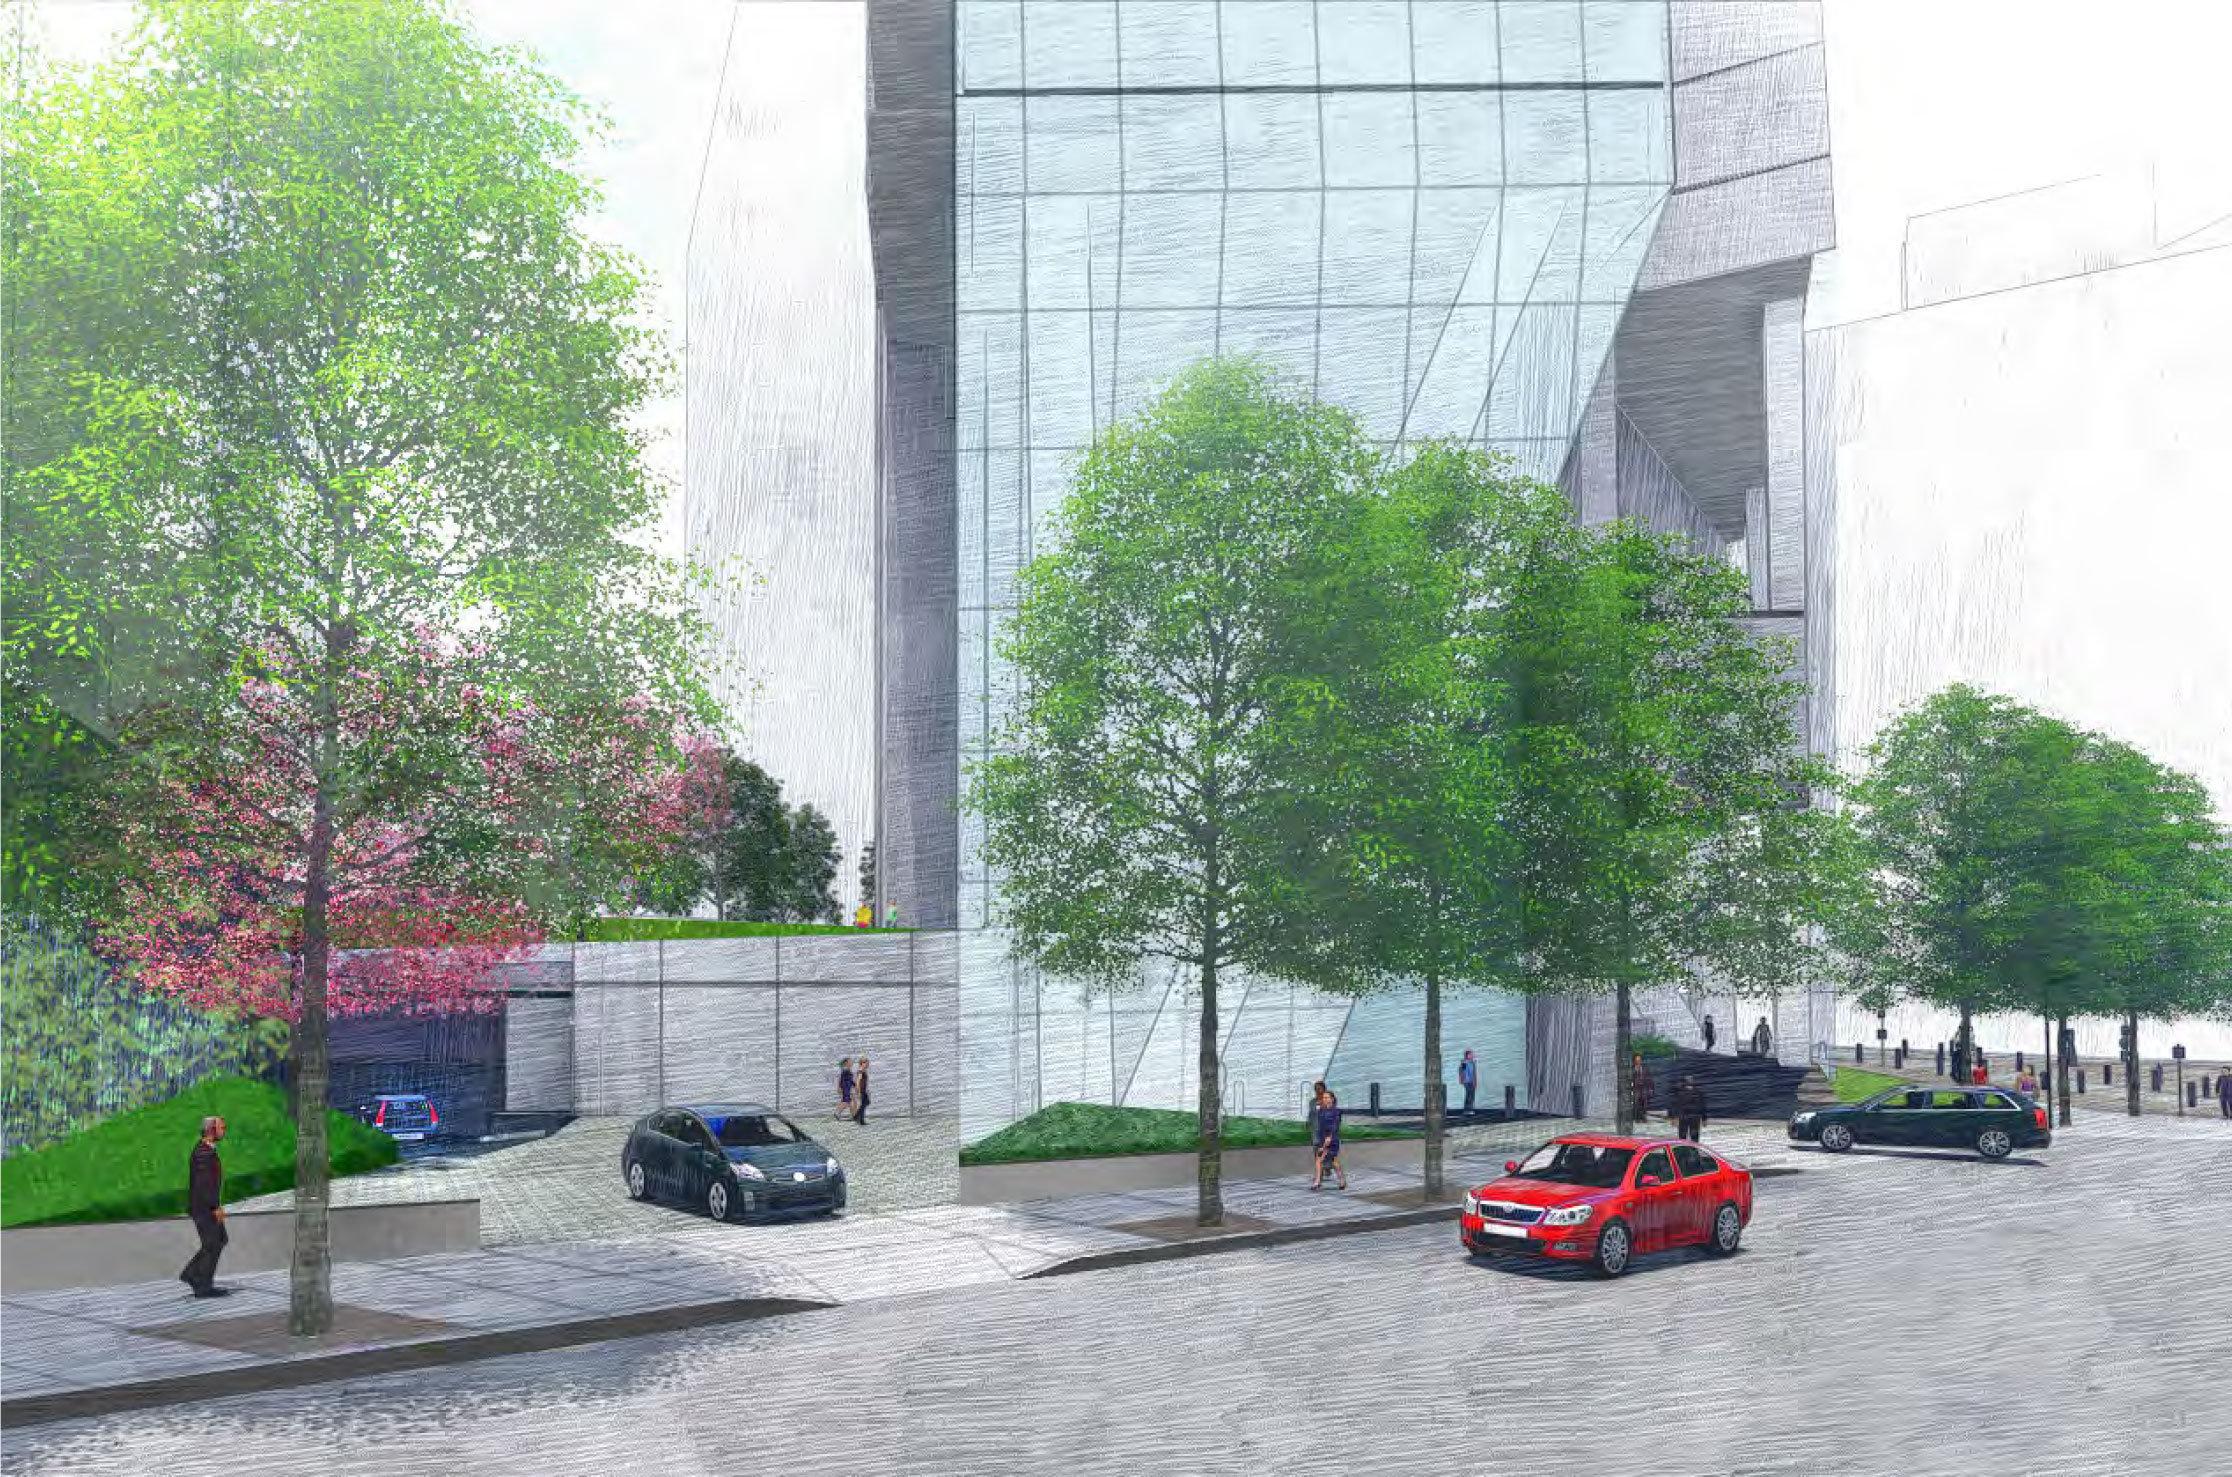 Rendering of Parking Entrance of Pender Street!